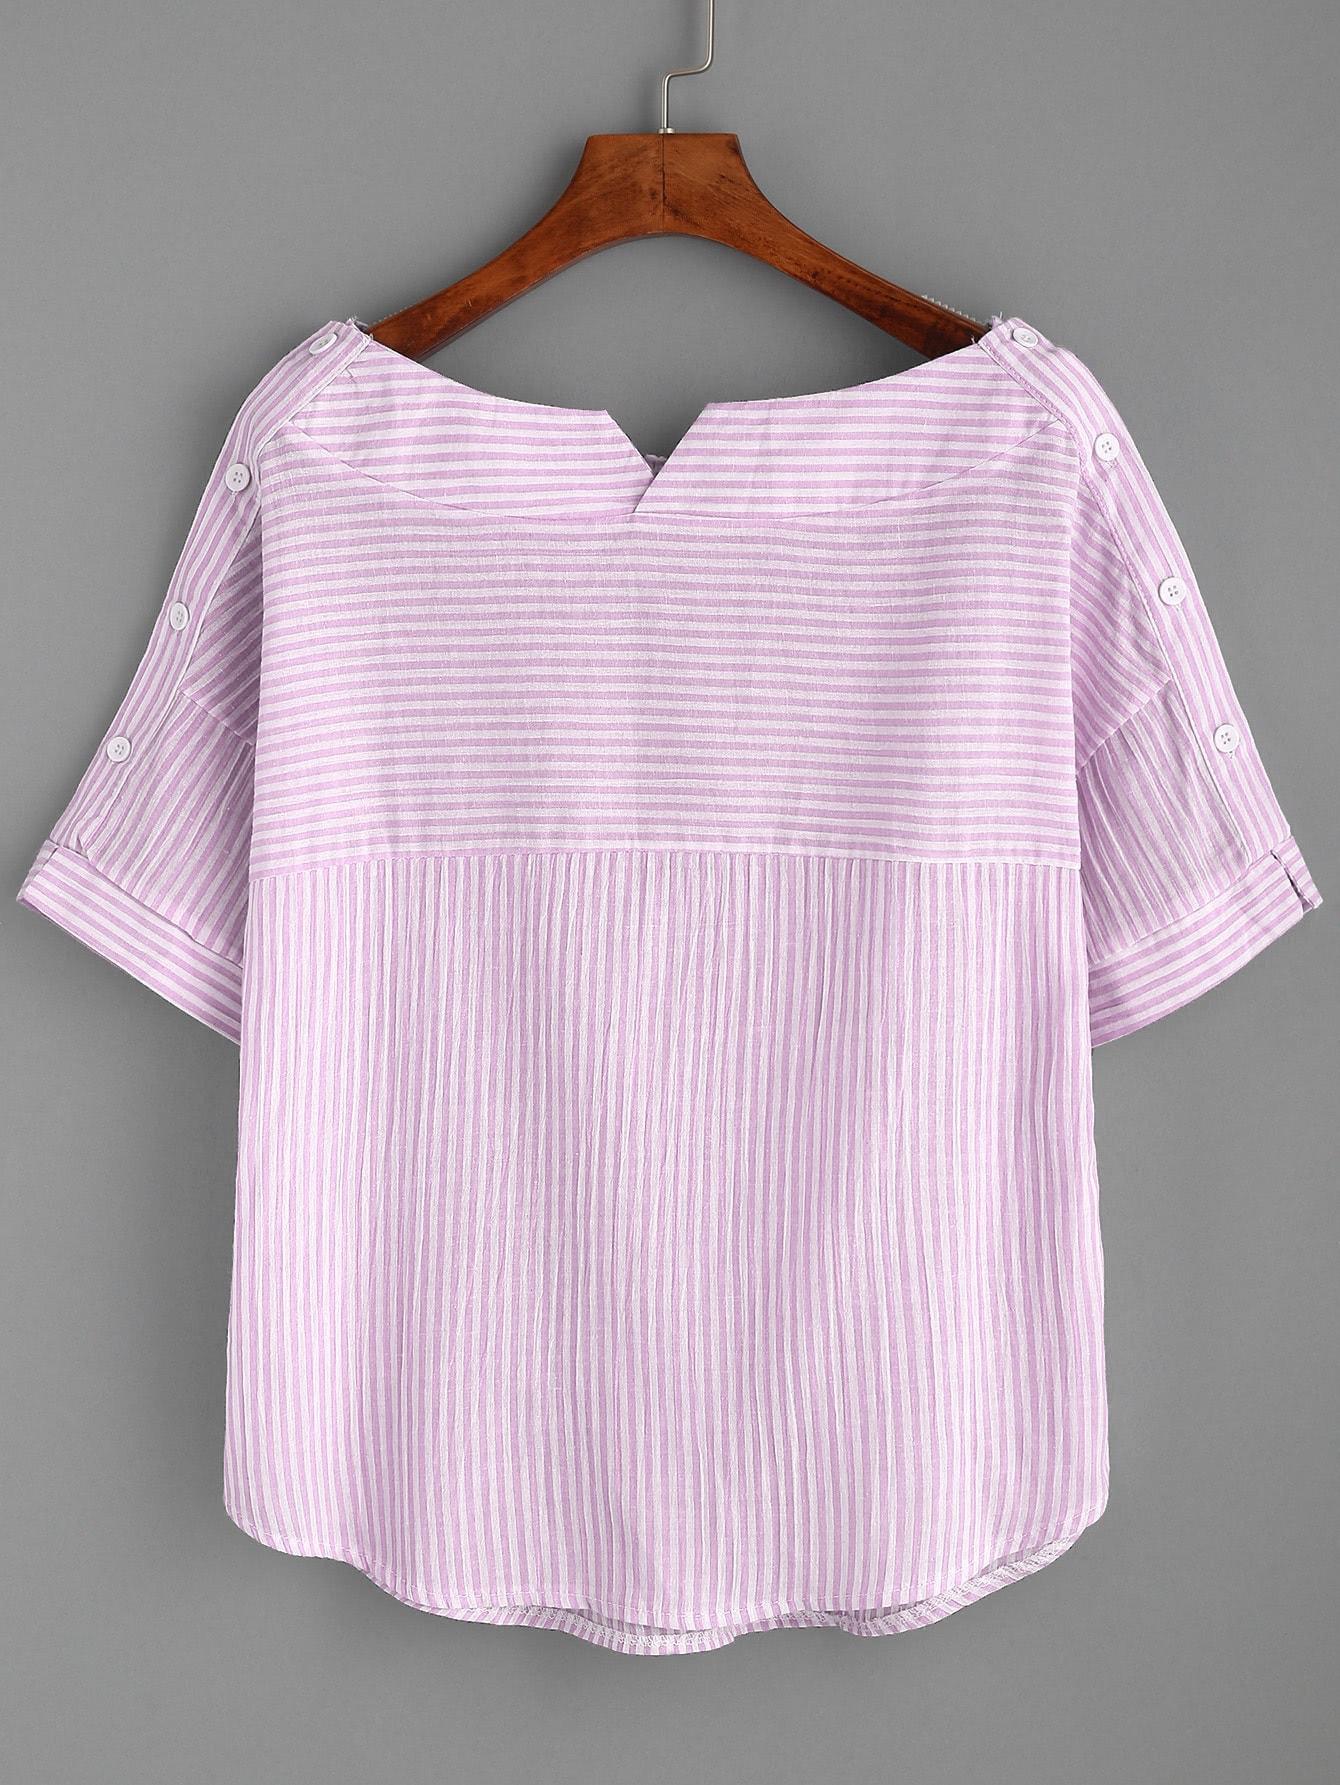 Boat Neckline Pinstripe Button Side Top blouse170413107